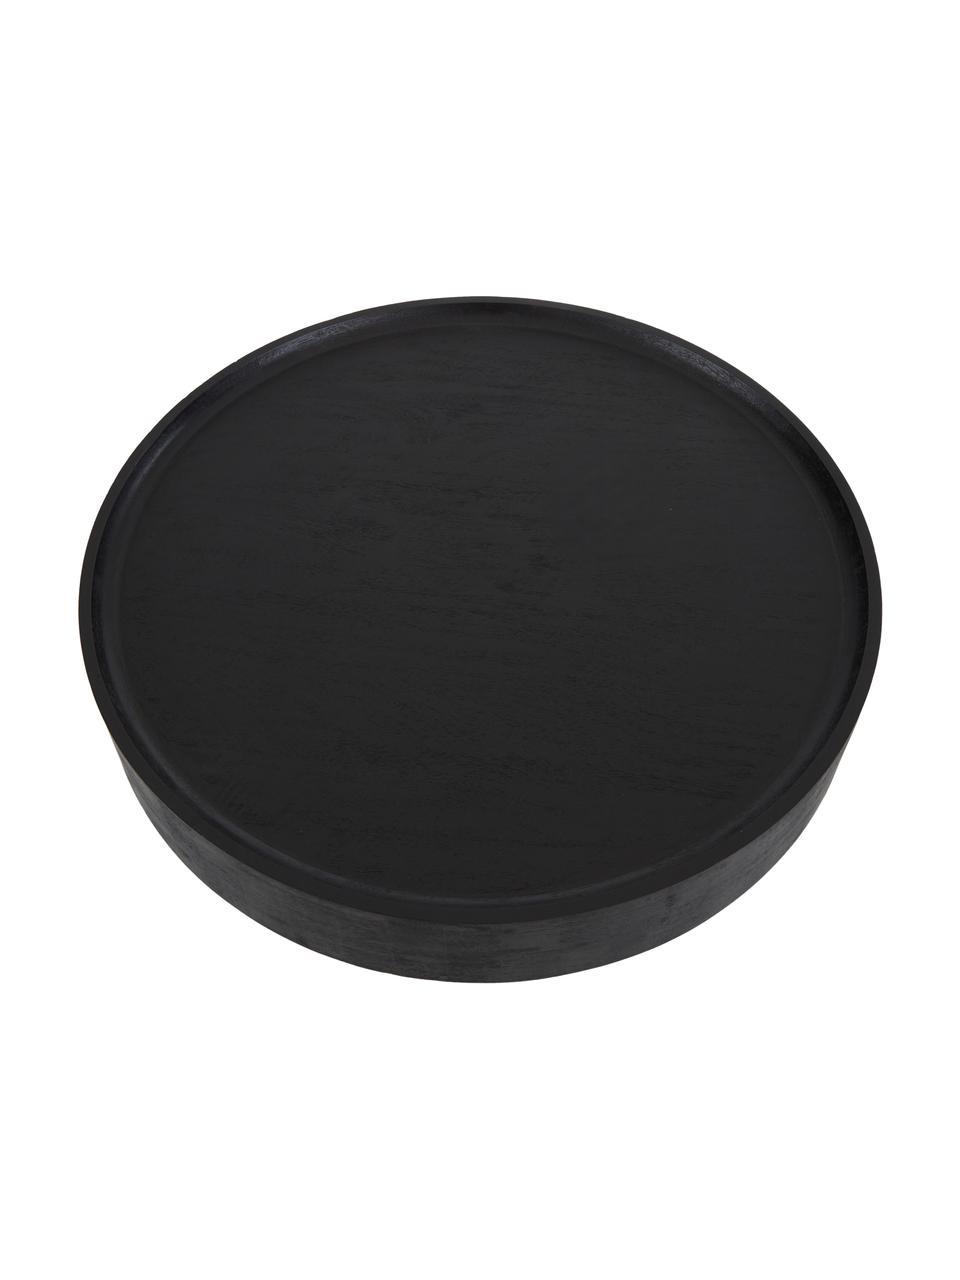 Salontafel Benno van mangohout in zwart, Massief gelakt essenhout, Zwart, Ø 80 x H 35 cm